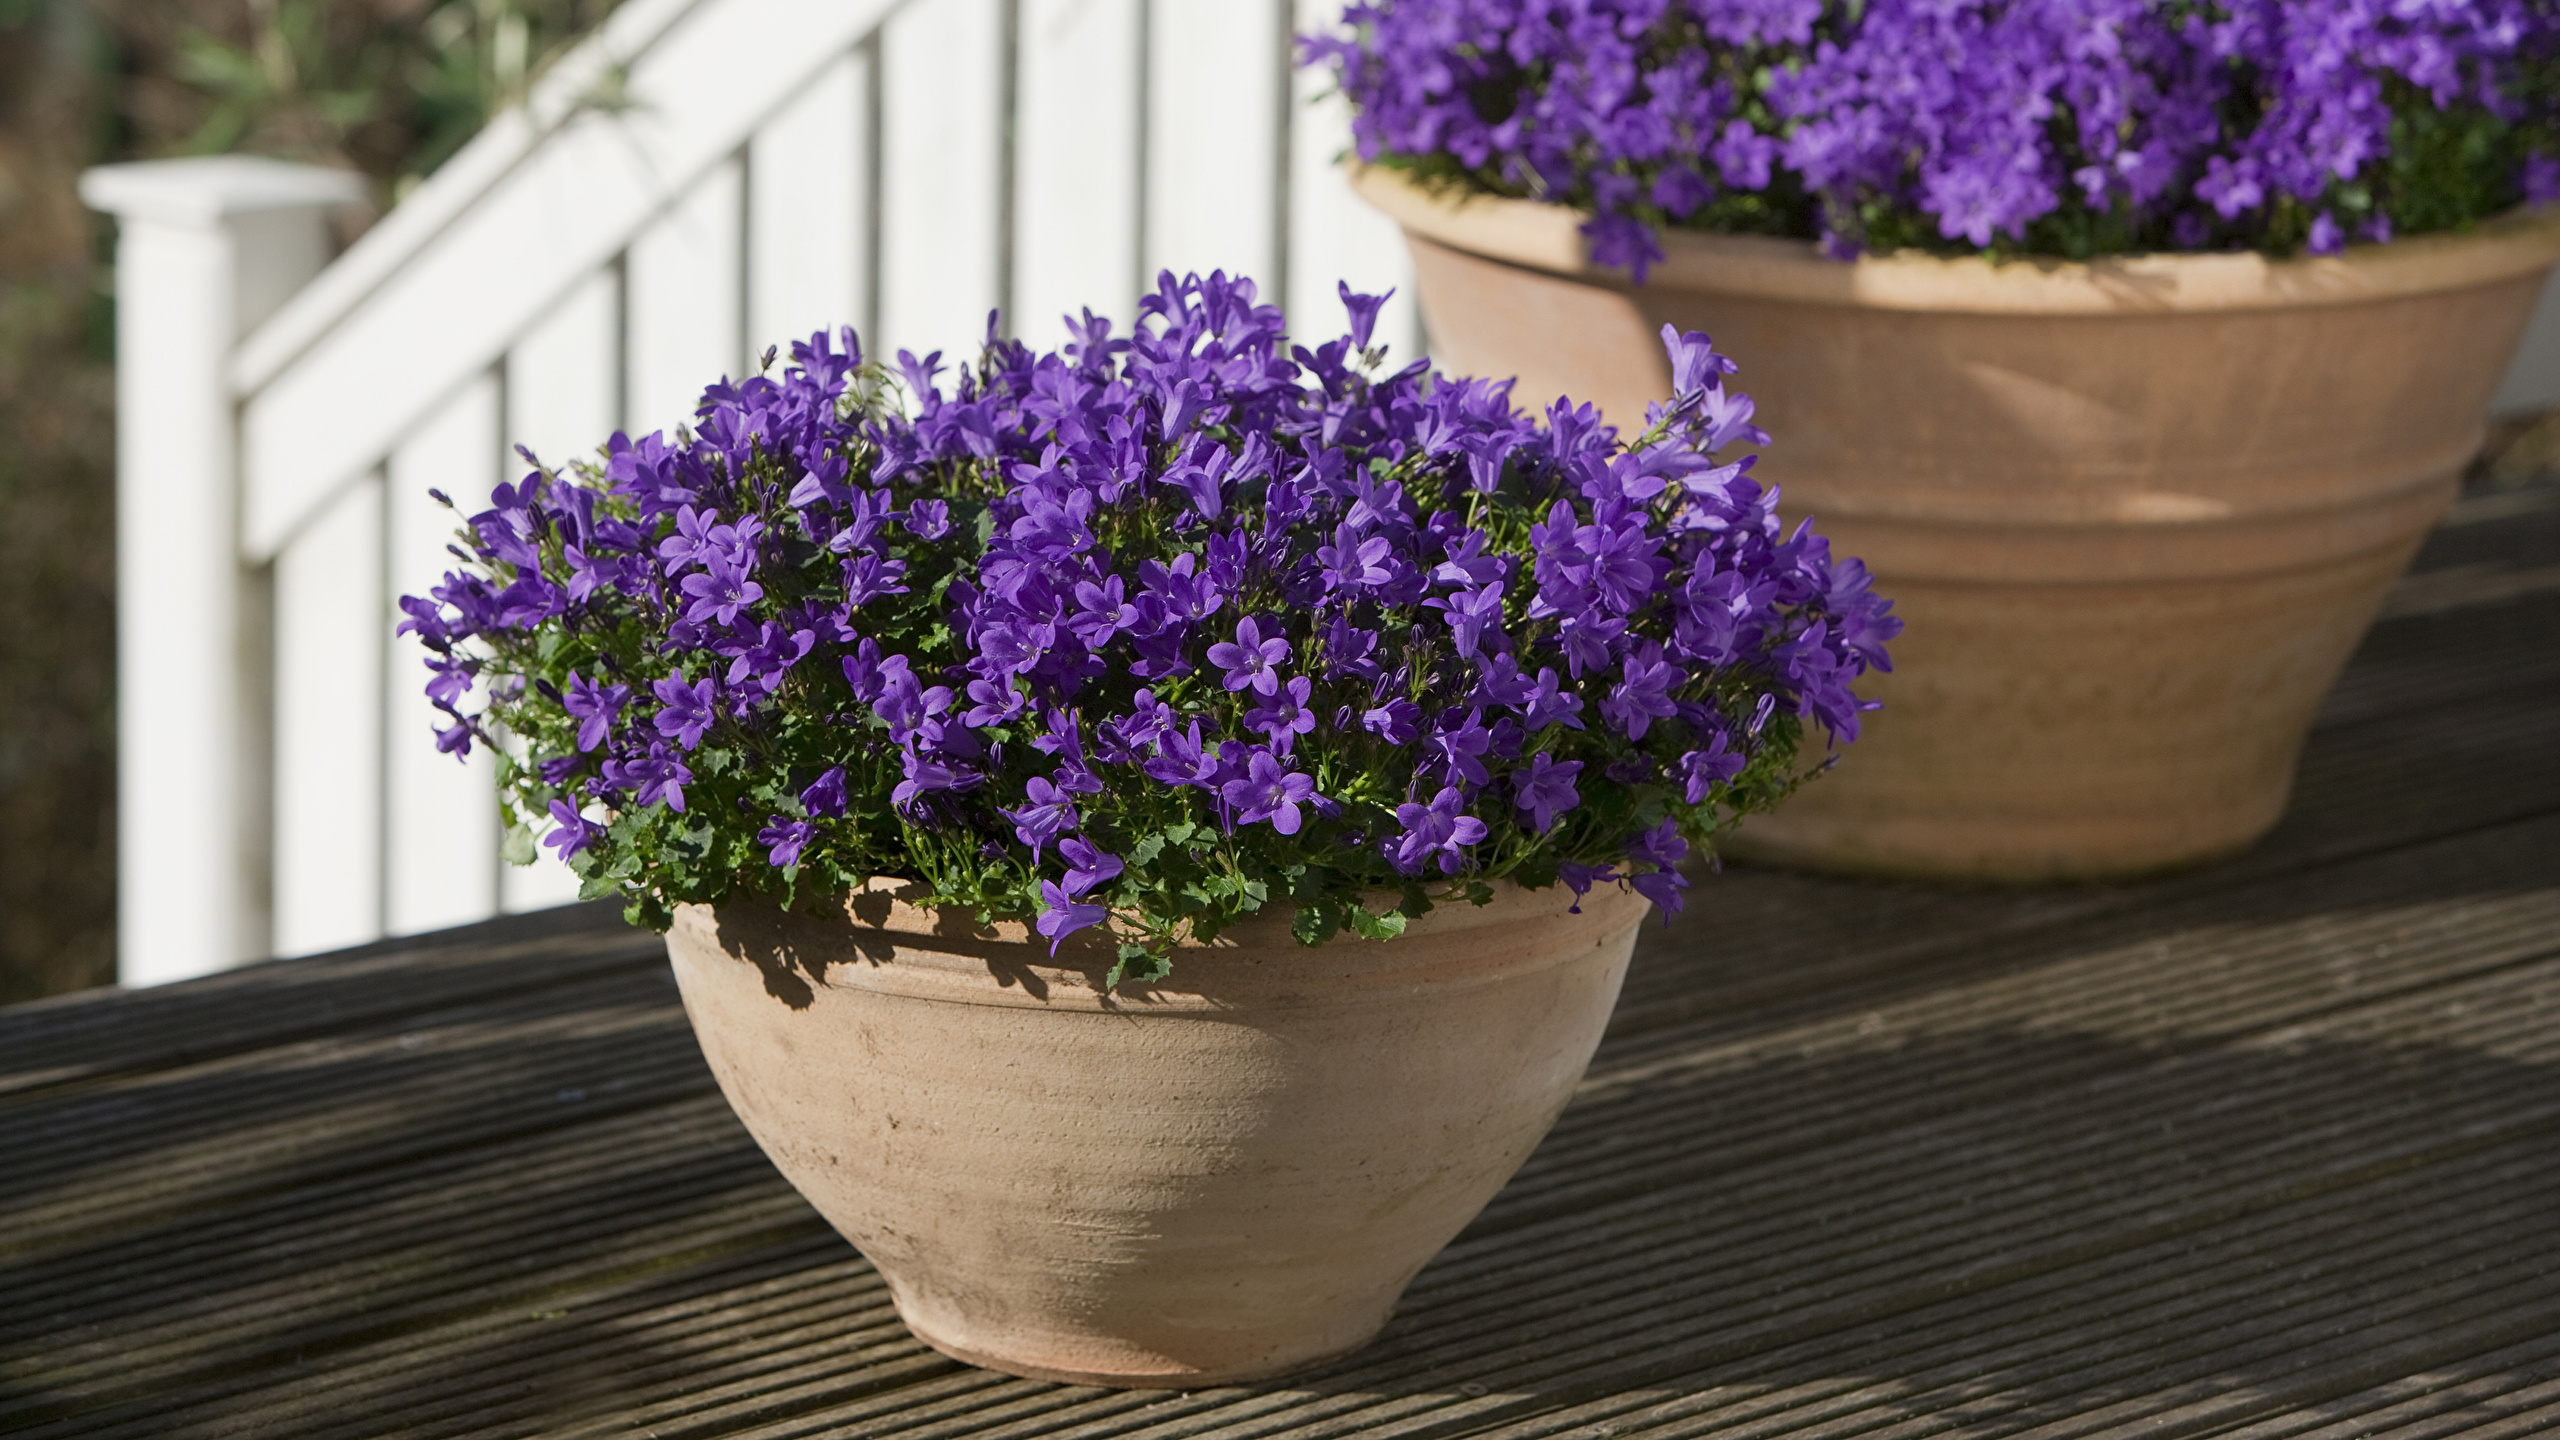 Como Cuidar de Violetas em Vasos